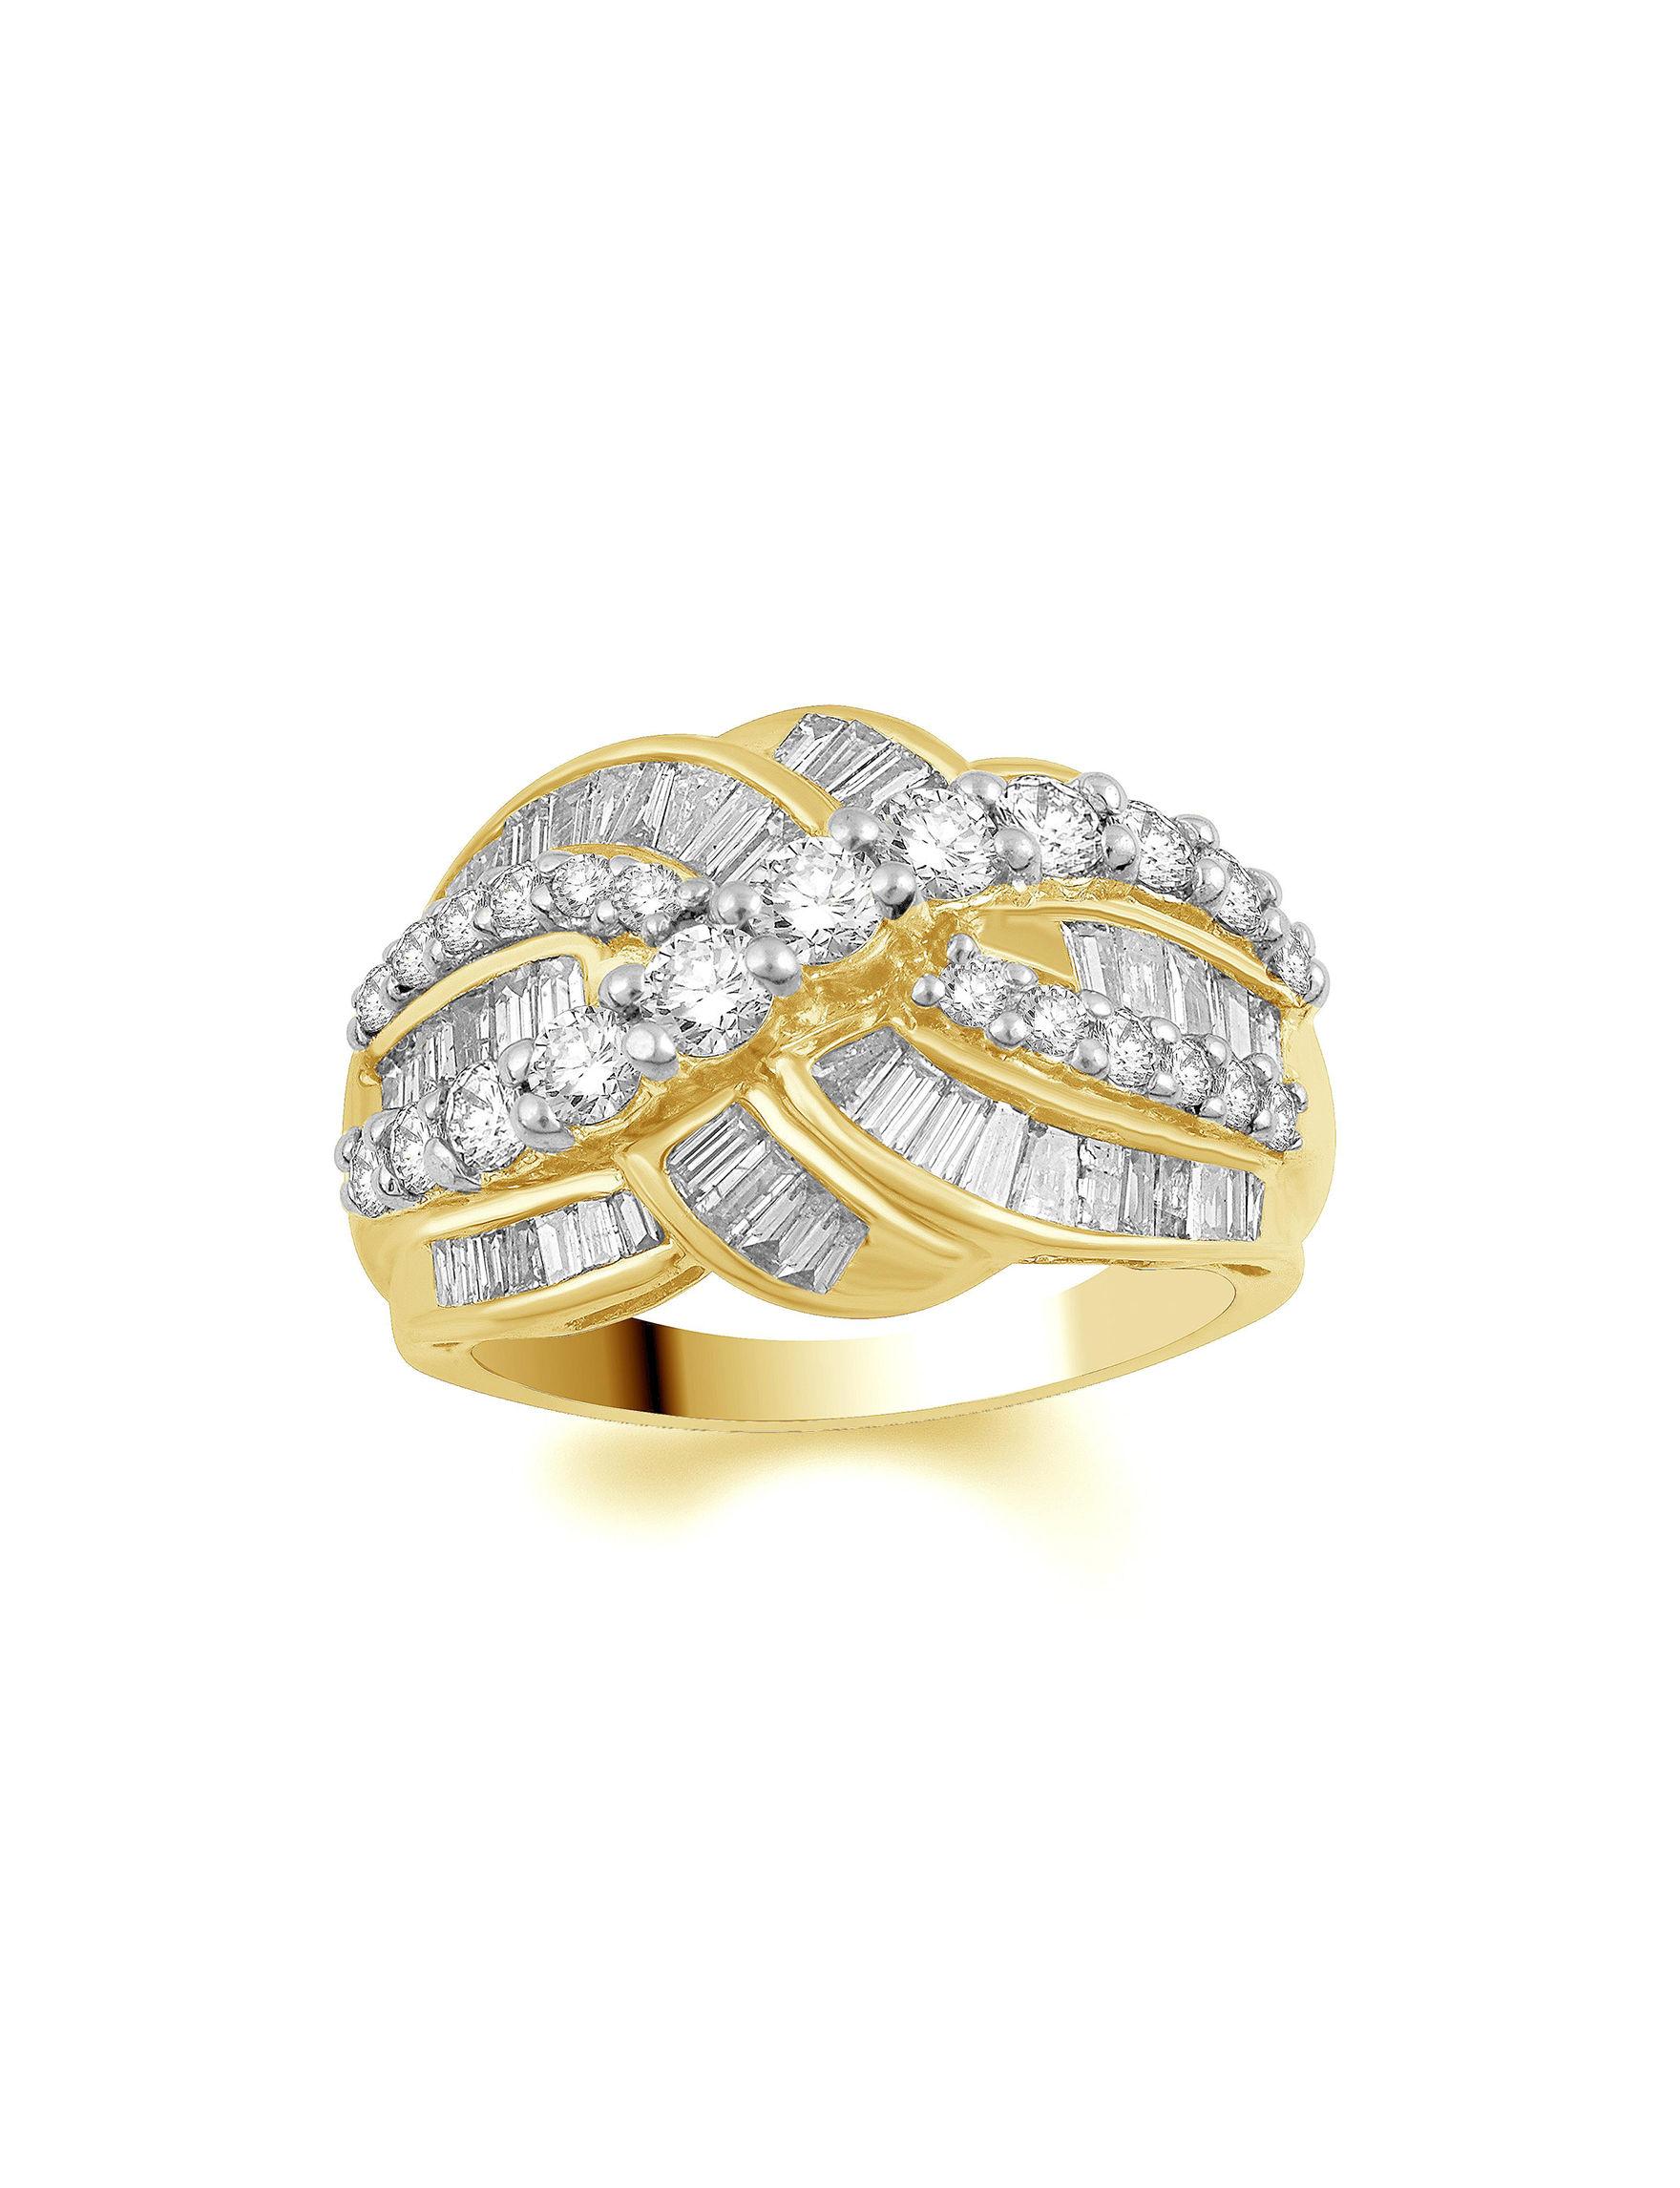 Kiran Gold Rings Fine Jewelry